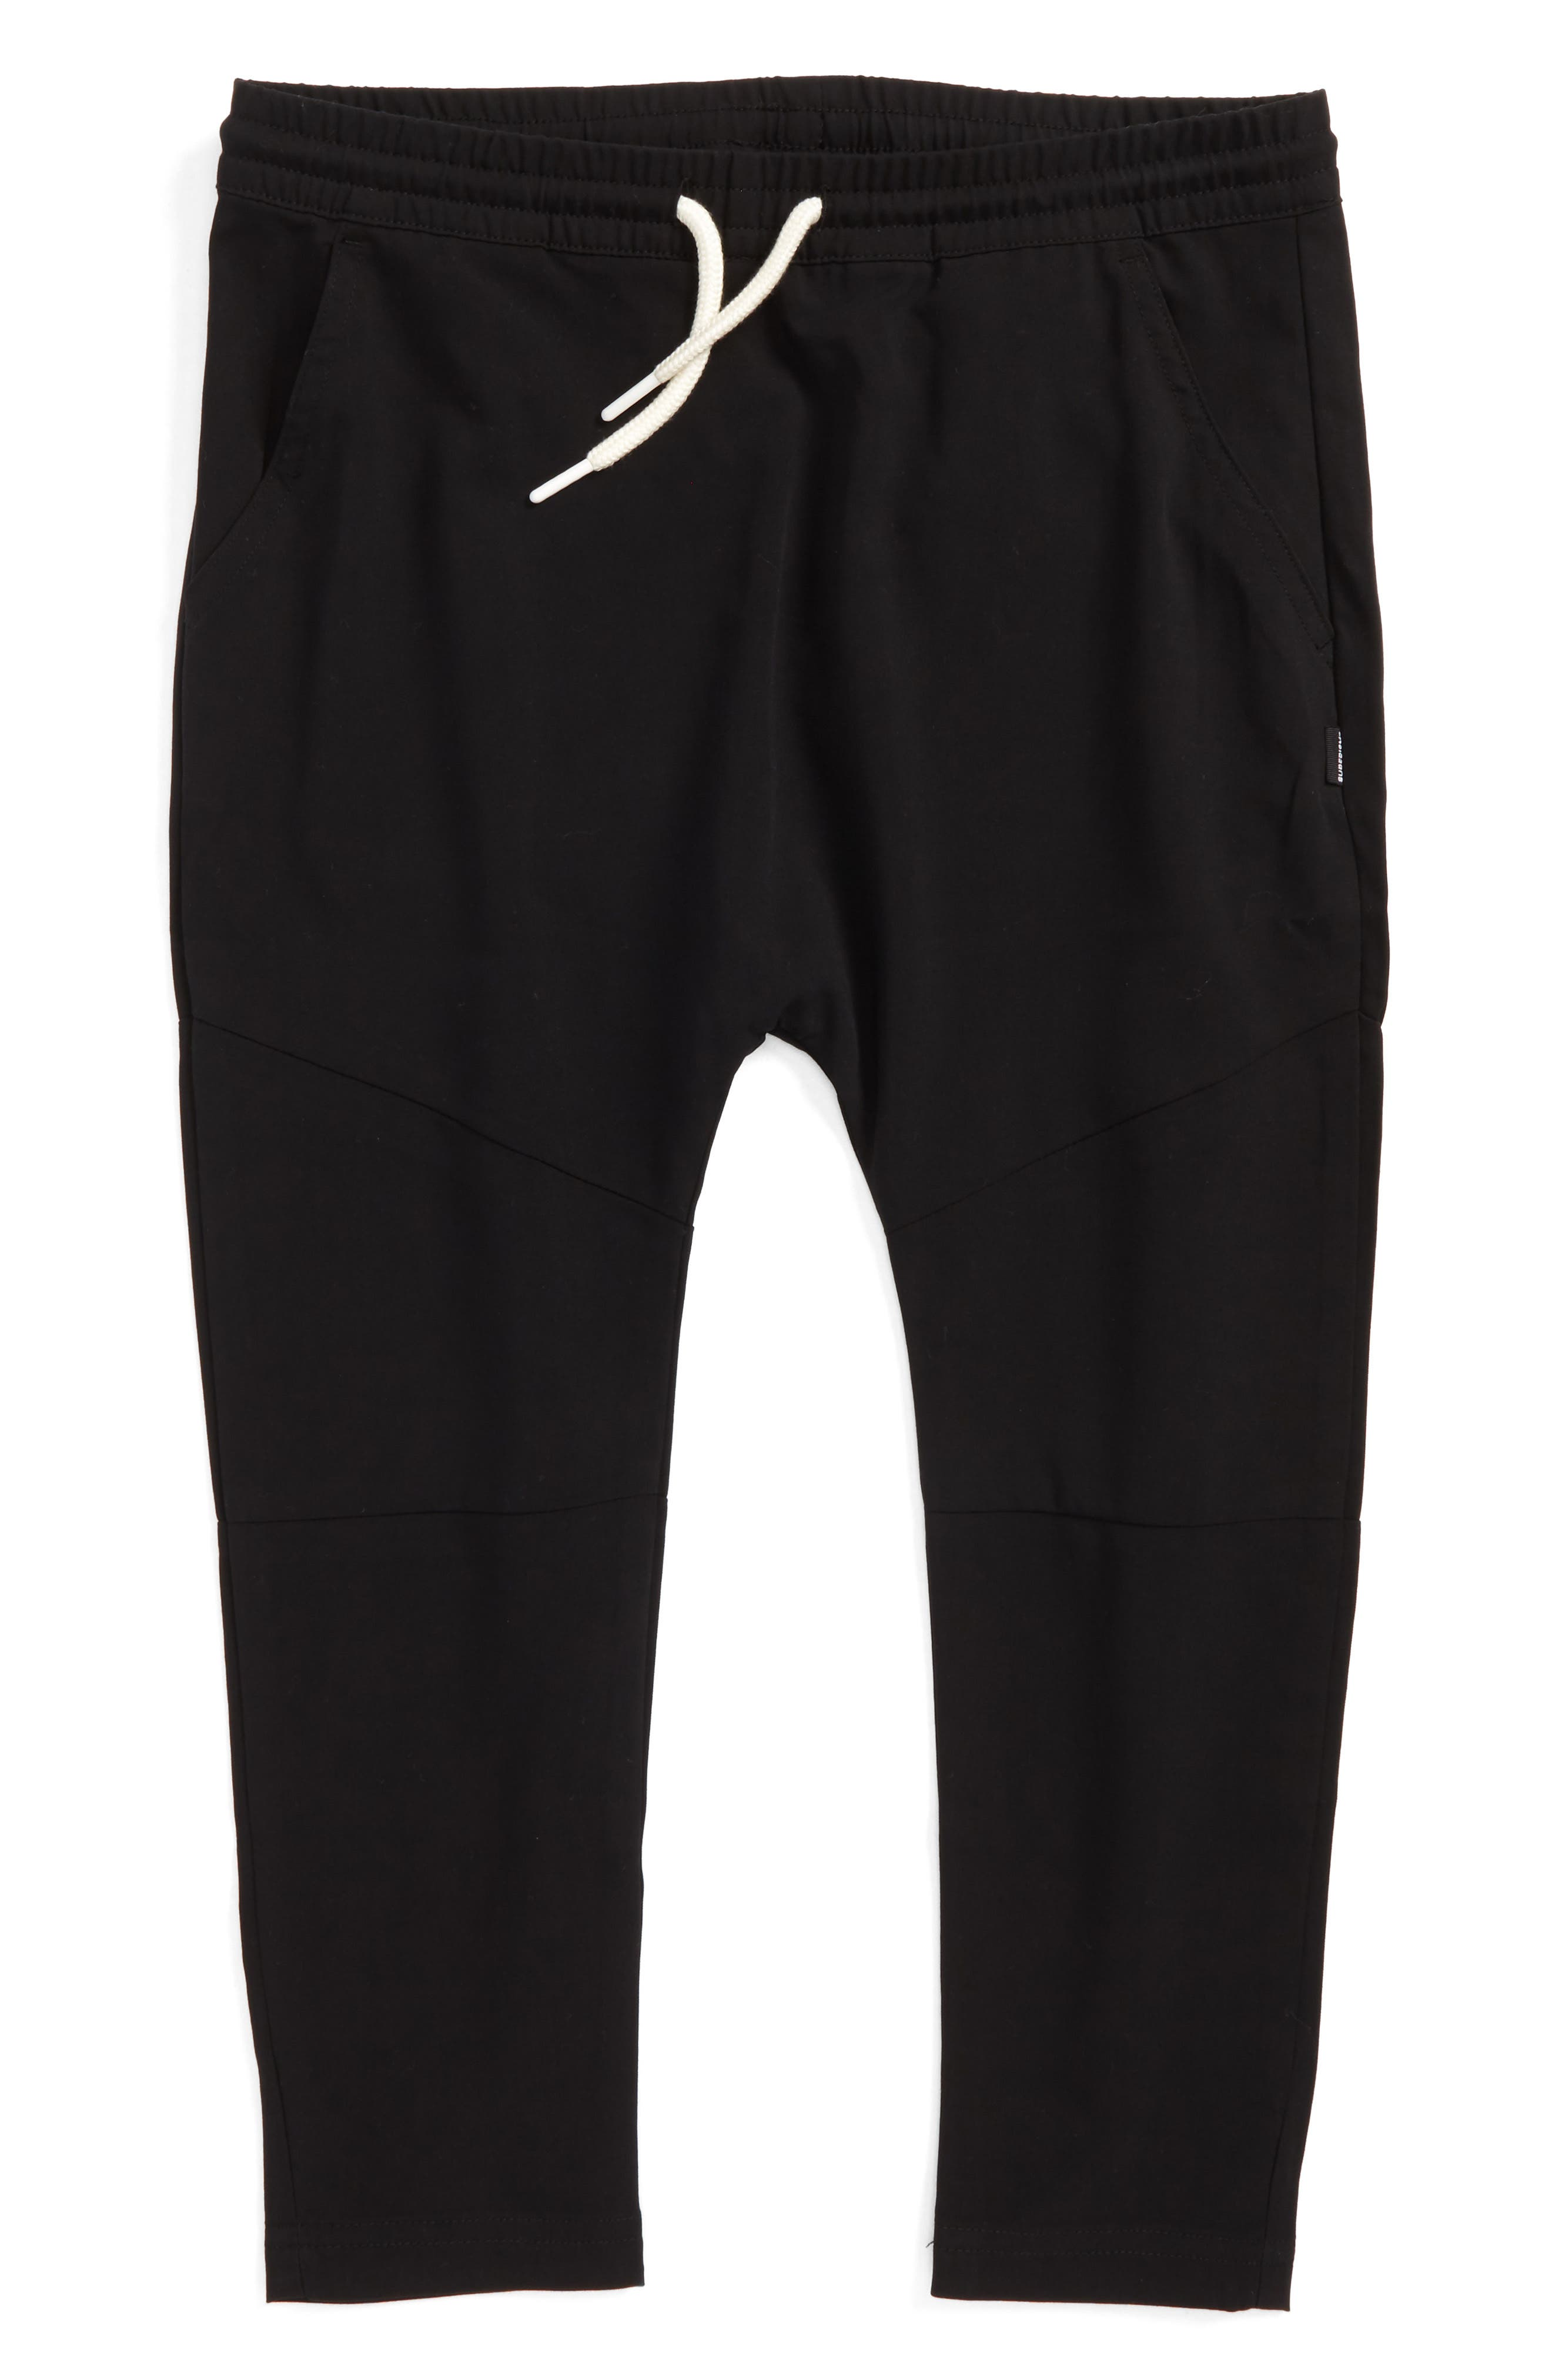 Superism Elliot Woven Jogger Pants (Big Boys)